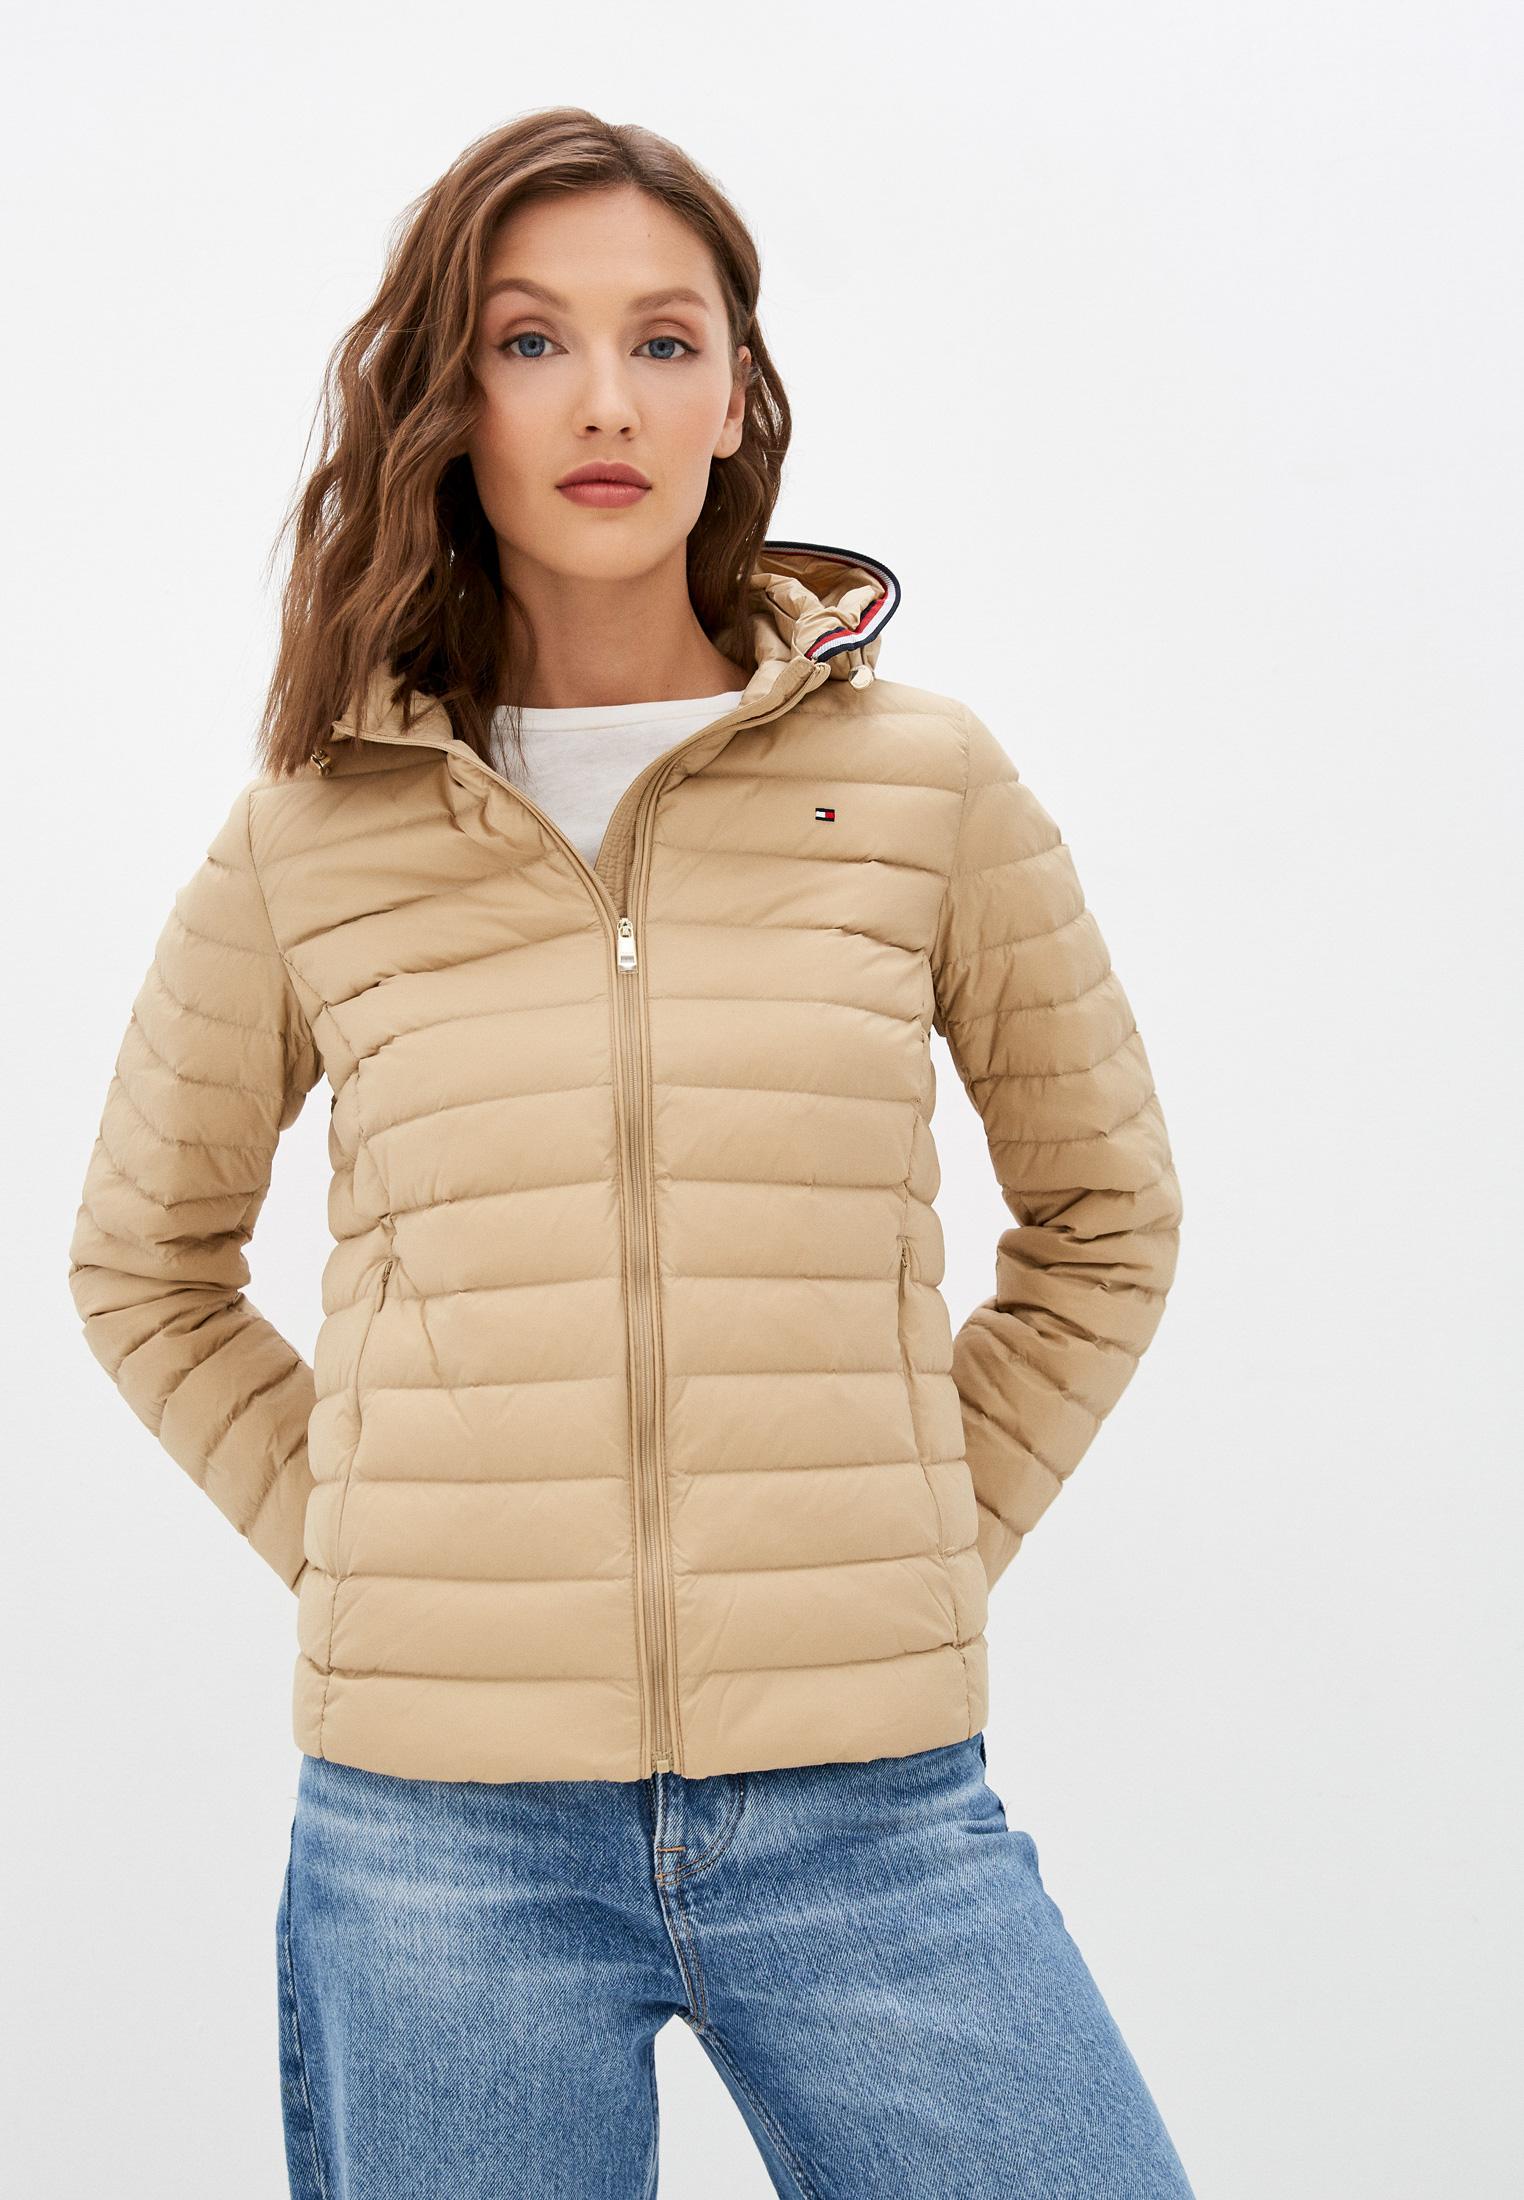 Утепленная куртка Tommy Hilfiger (Томми Хилфигер) WW0WW30842